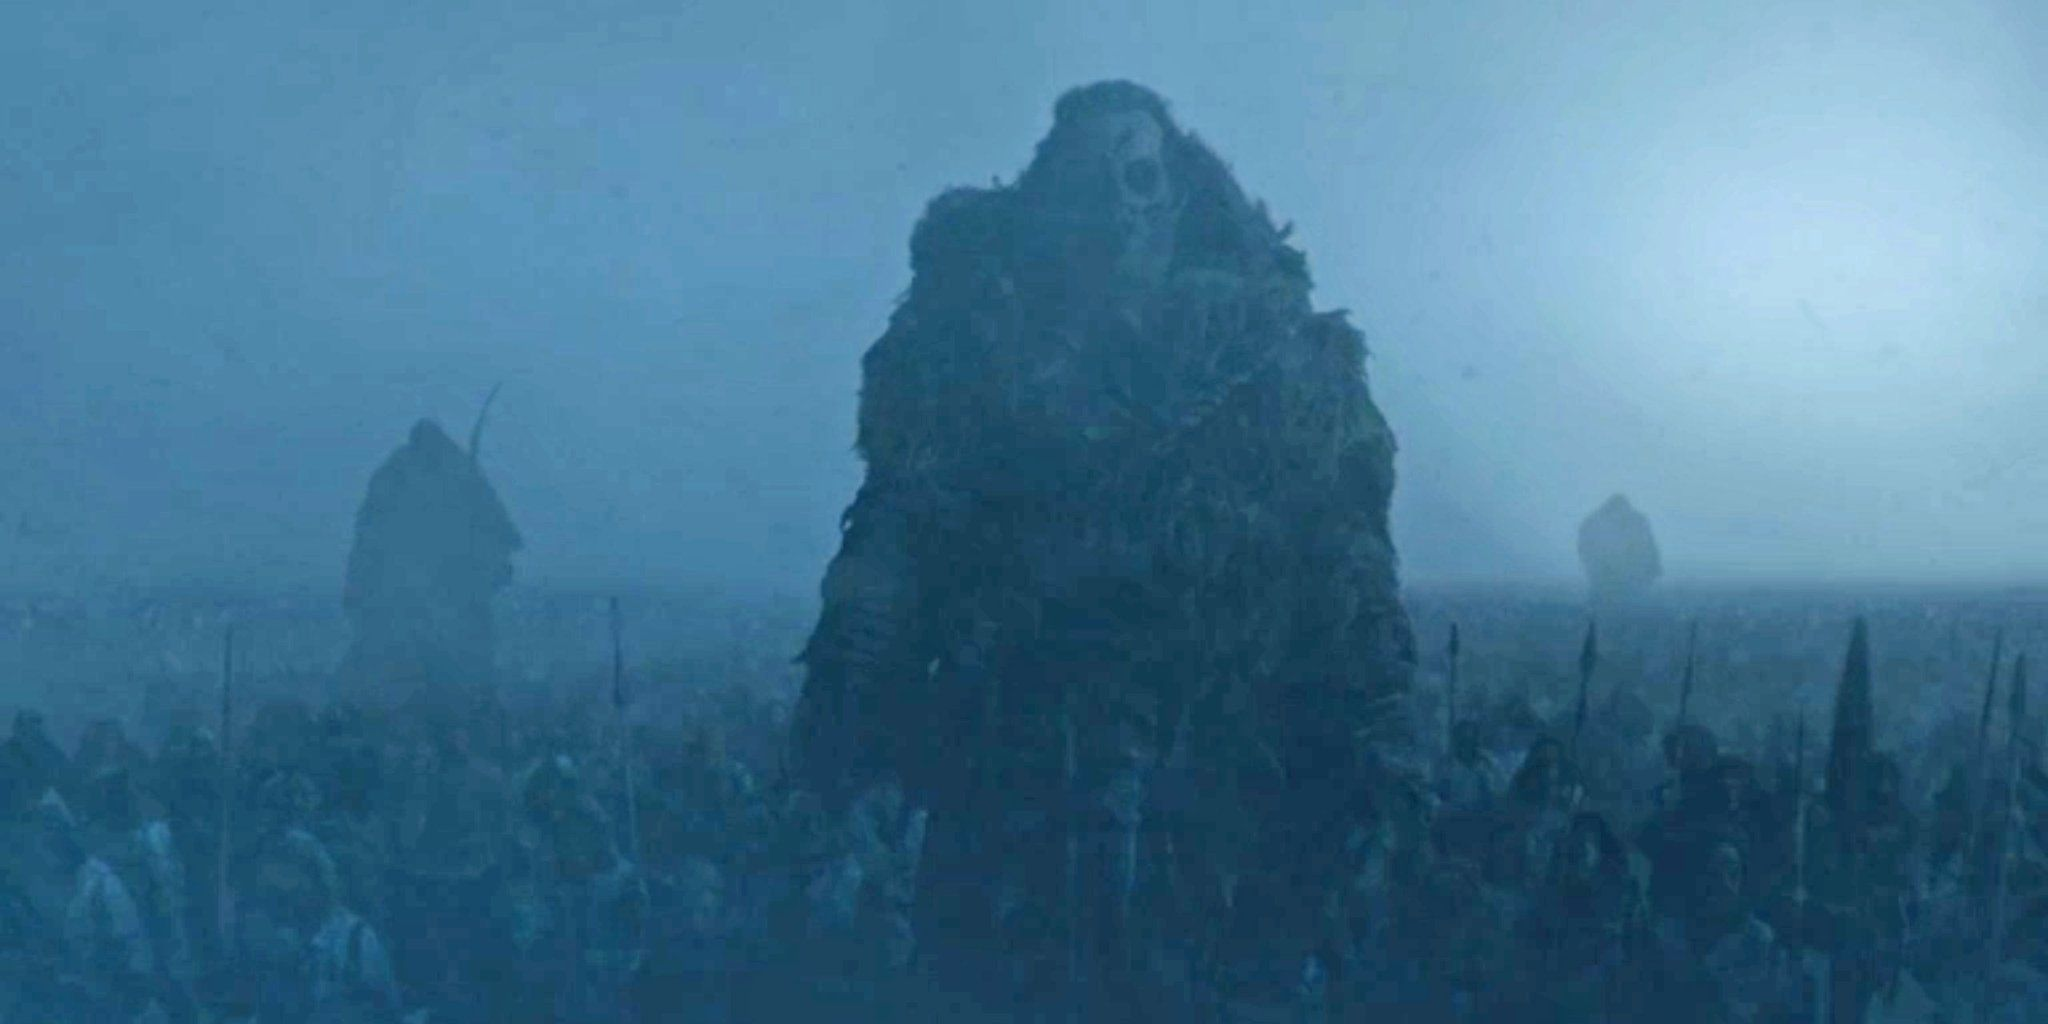 Game of Thrones zombie giant